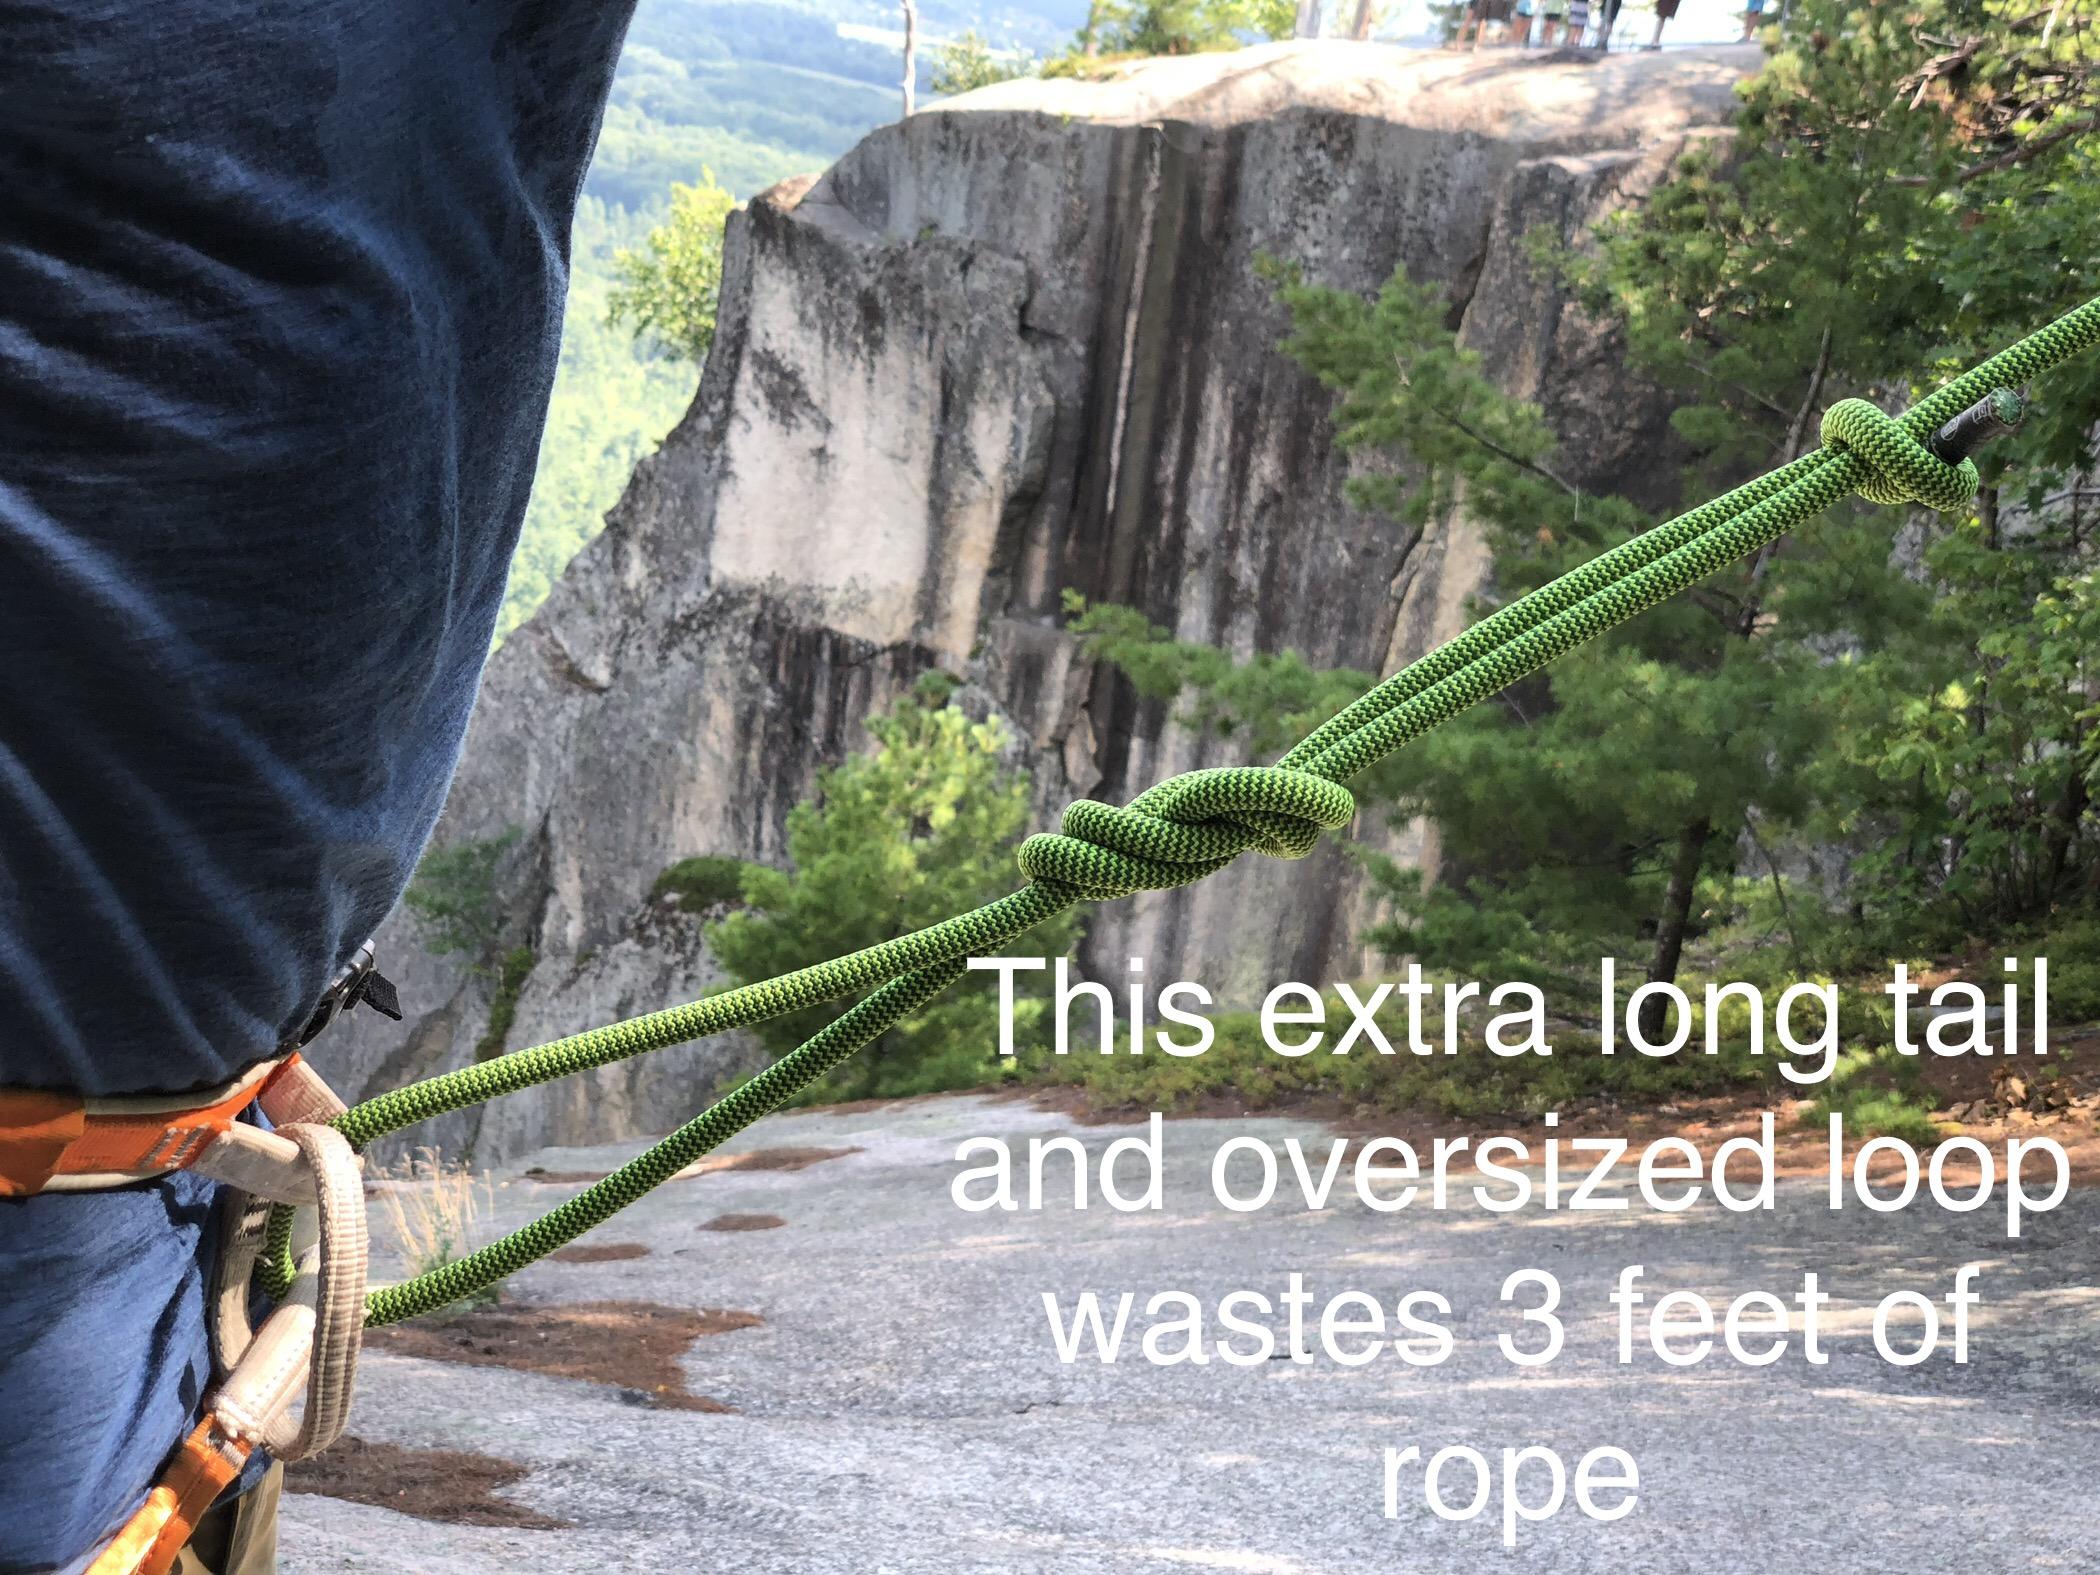 Tying into climbing rope